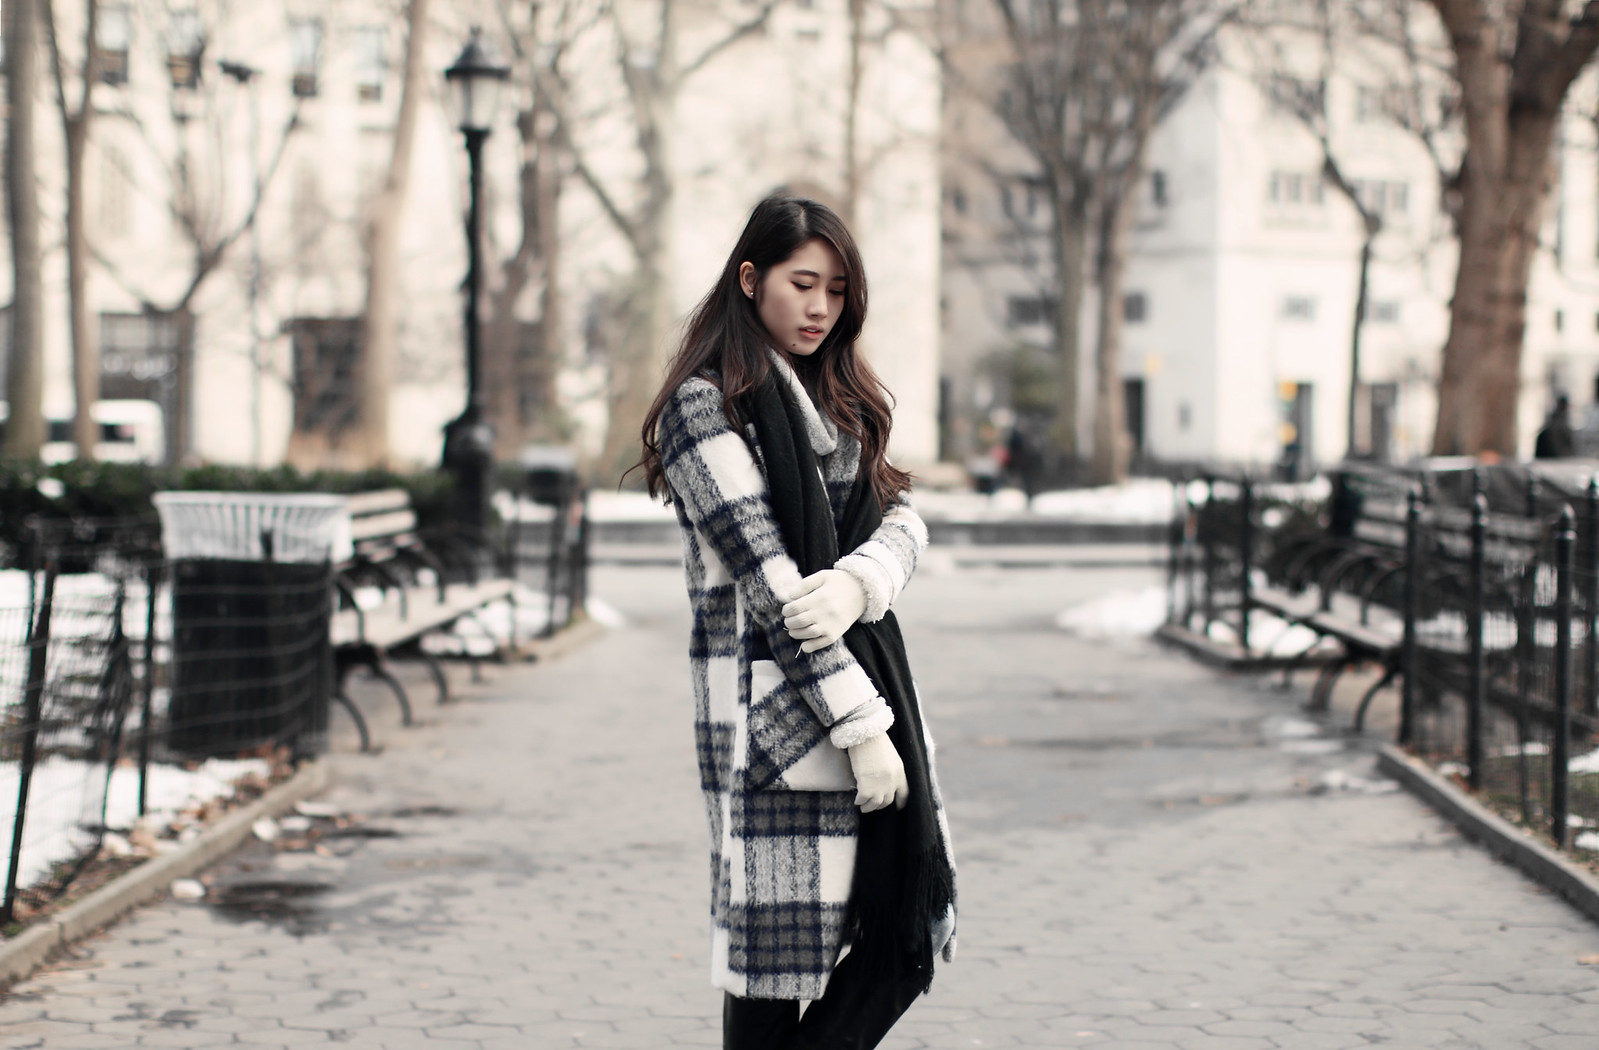 2086-clothestoyouuu-elizabeeetht-nyfw-newyorkfashionweek-nyc-fashionweek-newyork- winter2017-fashion-ootd